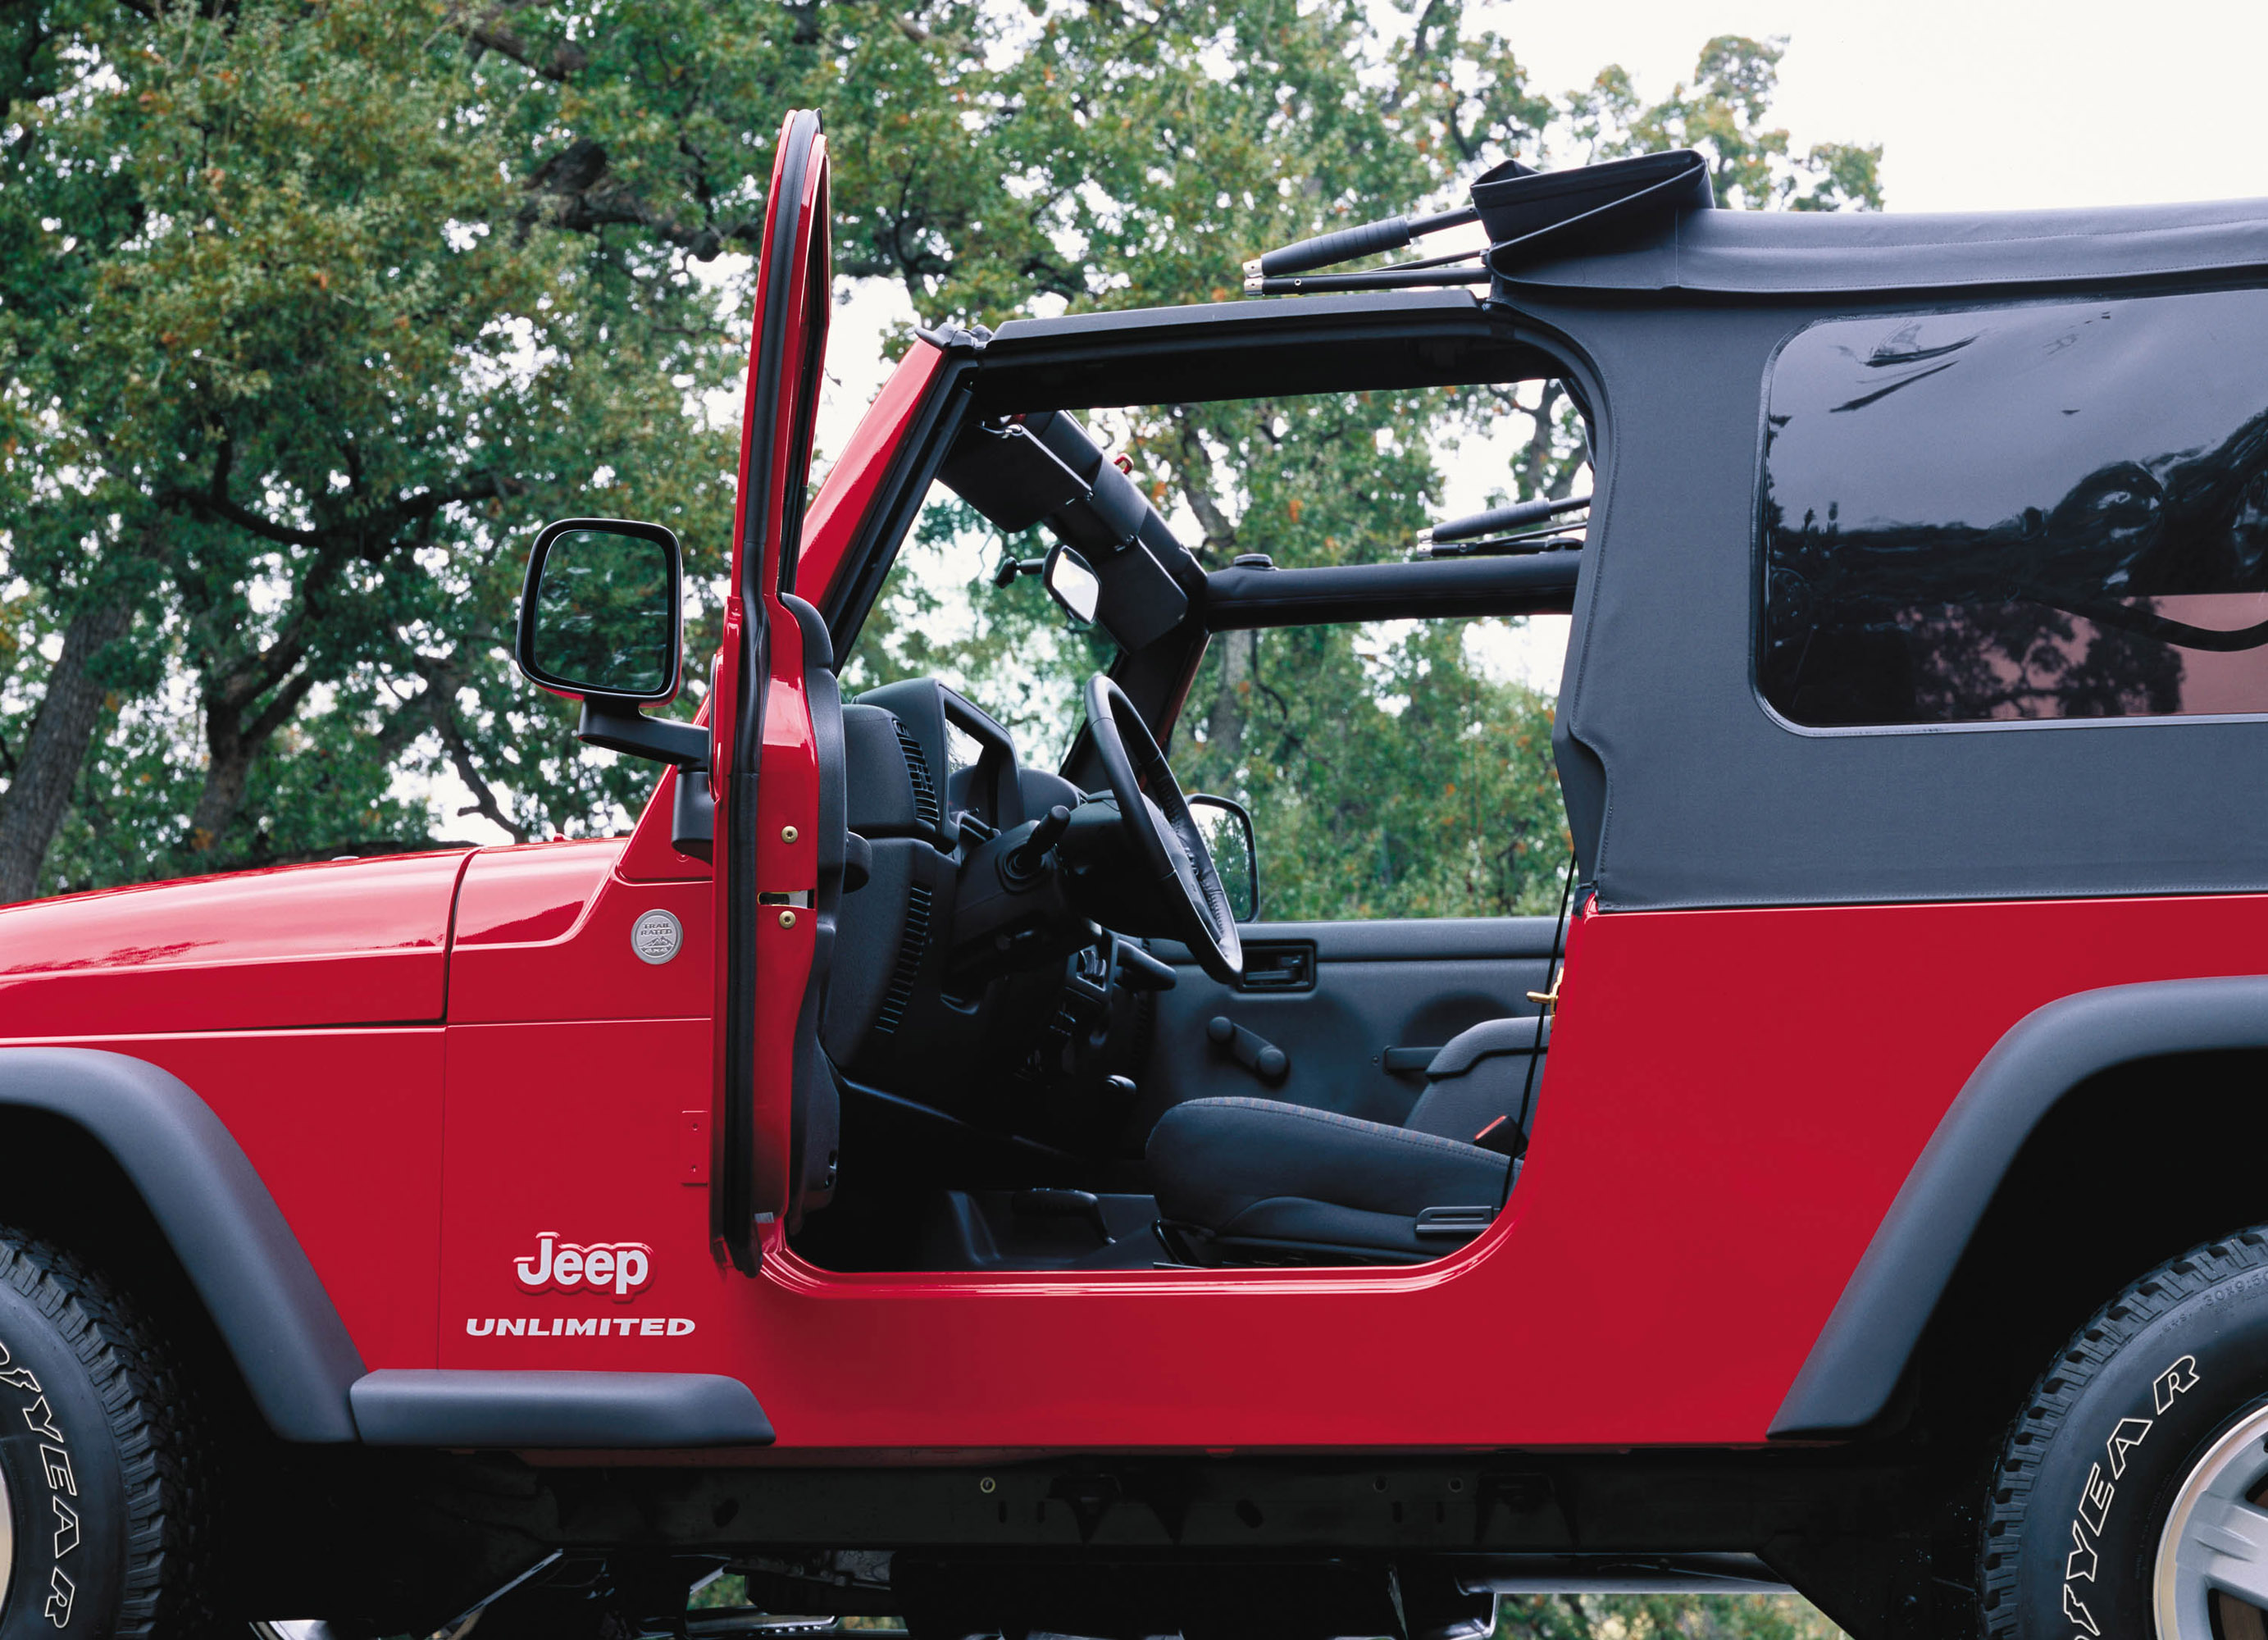 2004 Jeep Wrangler Unlimited Thumbnail Photo 59567